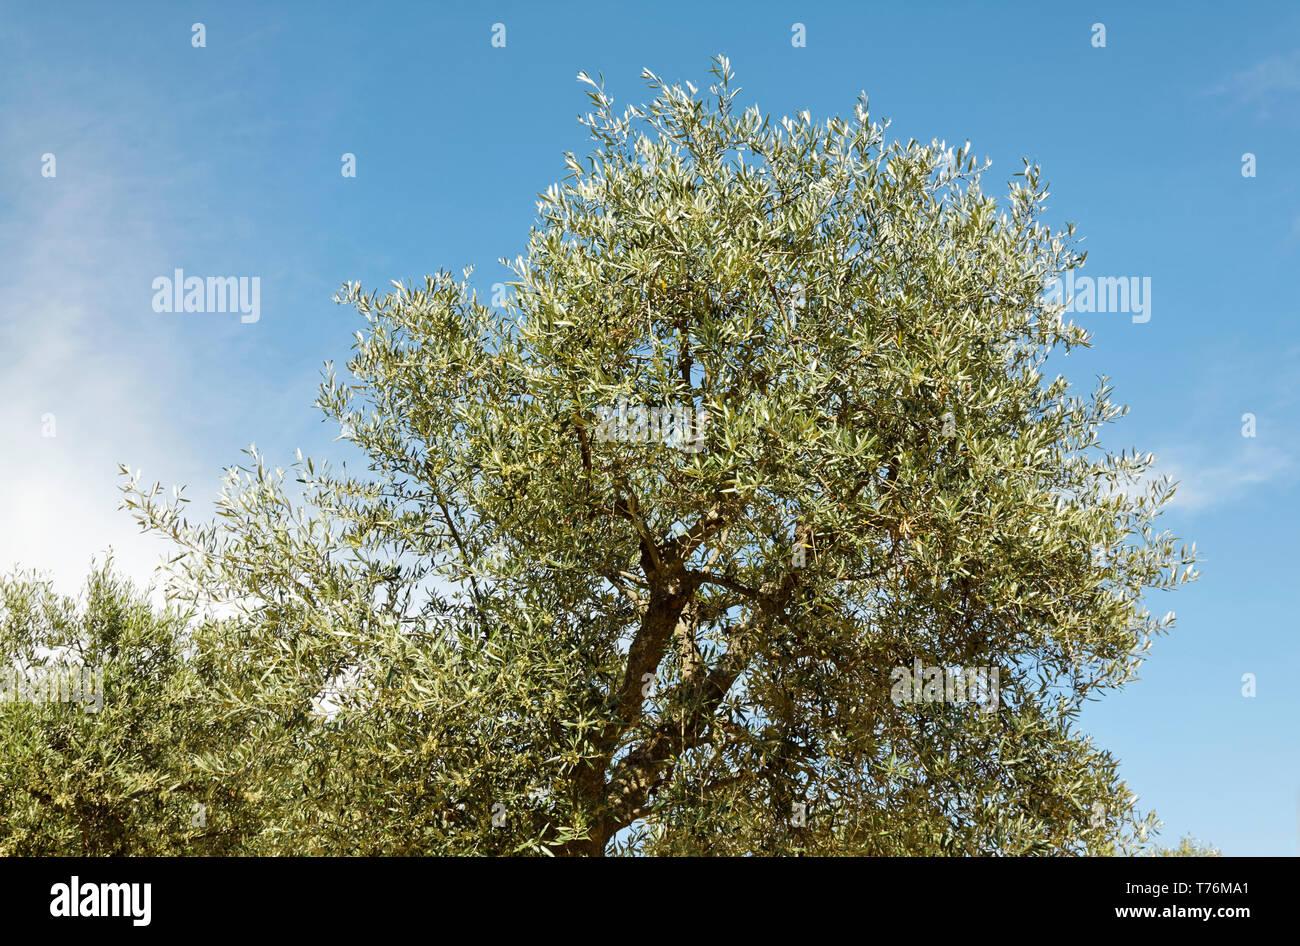 olive tree, fruit, nature, evergreen, Olea europaea, Douro River Valley, Europe, Portugal, spring, horizontal Stock Photo